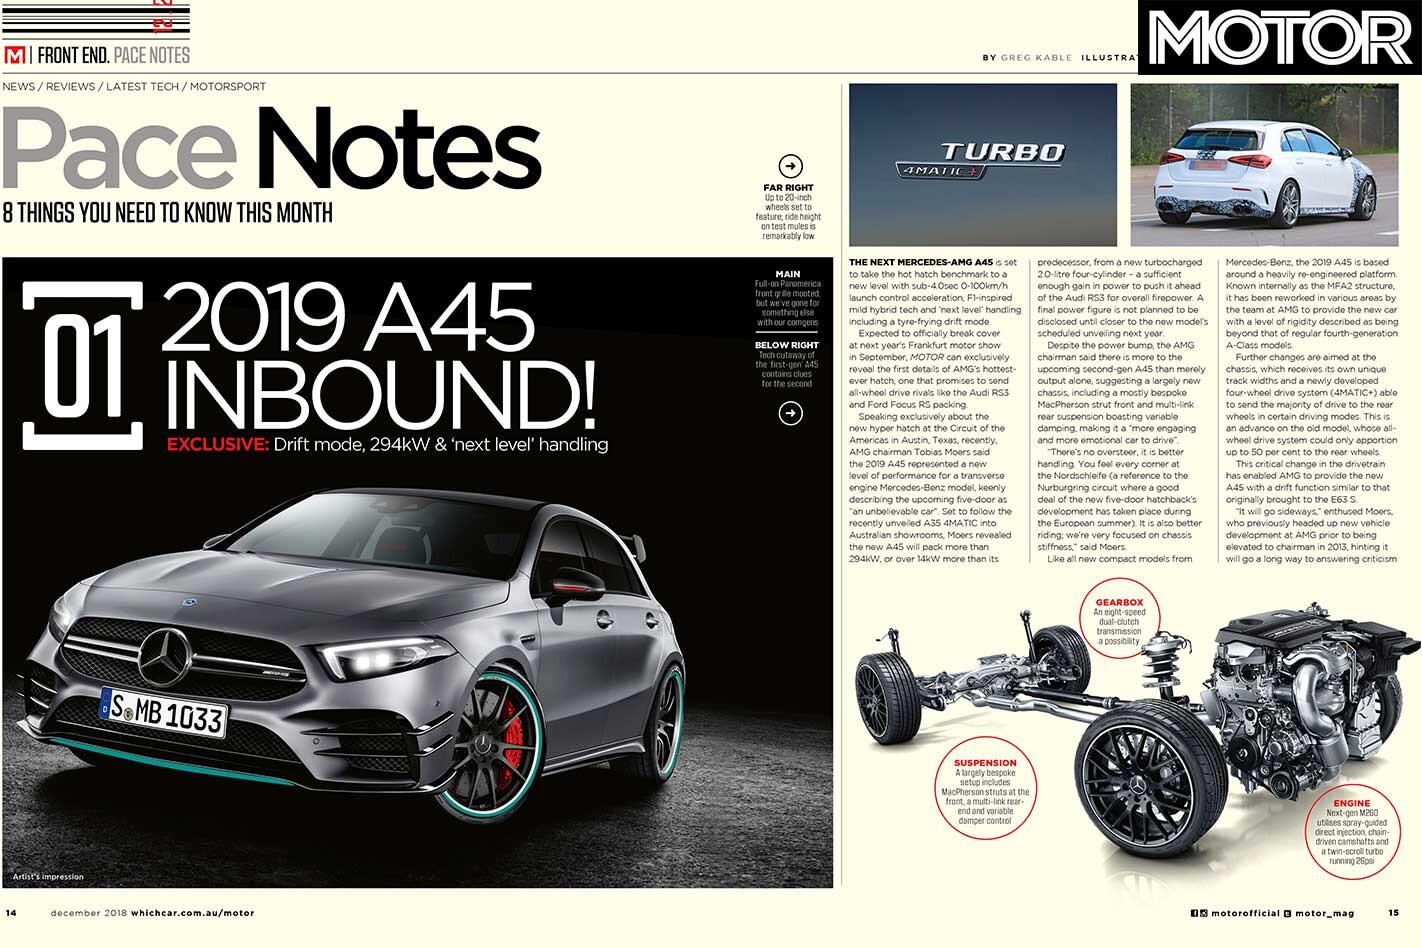 MOTOR Magazine December 2018 Preview AMG A 45 Jpg